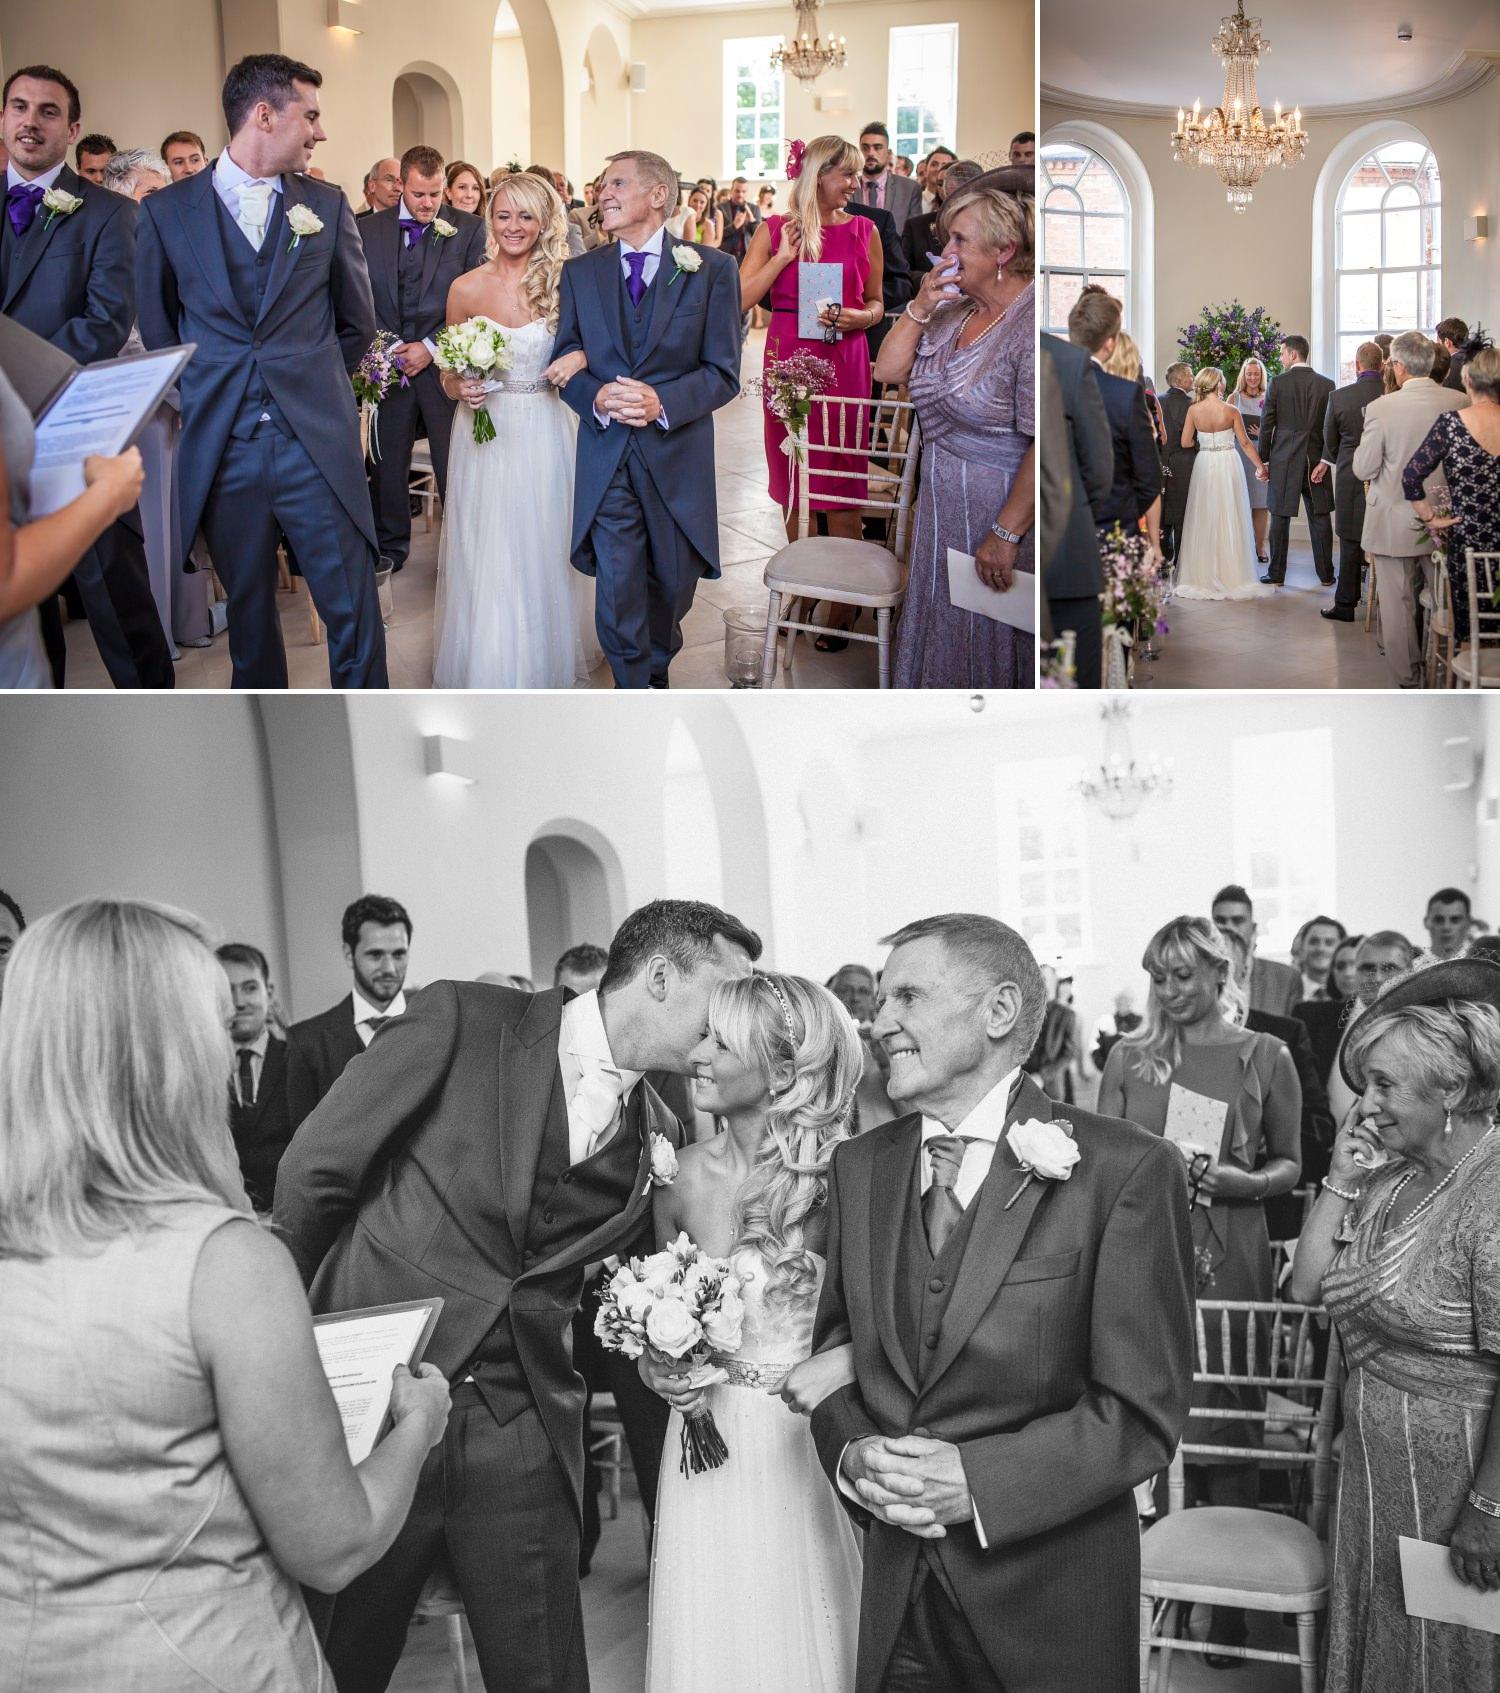 Wedding Photography of wedding ceremony at Iscoyd Park